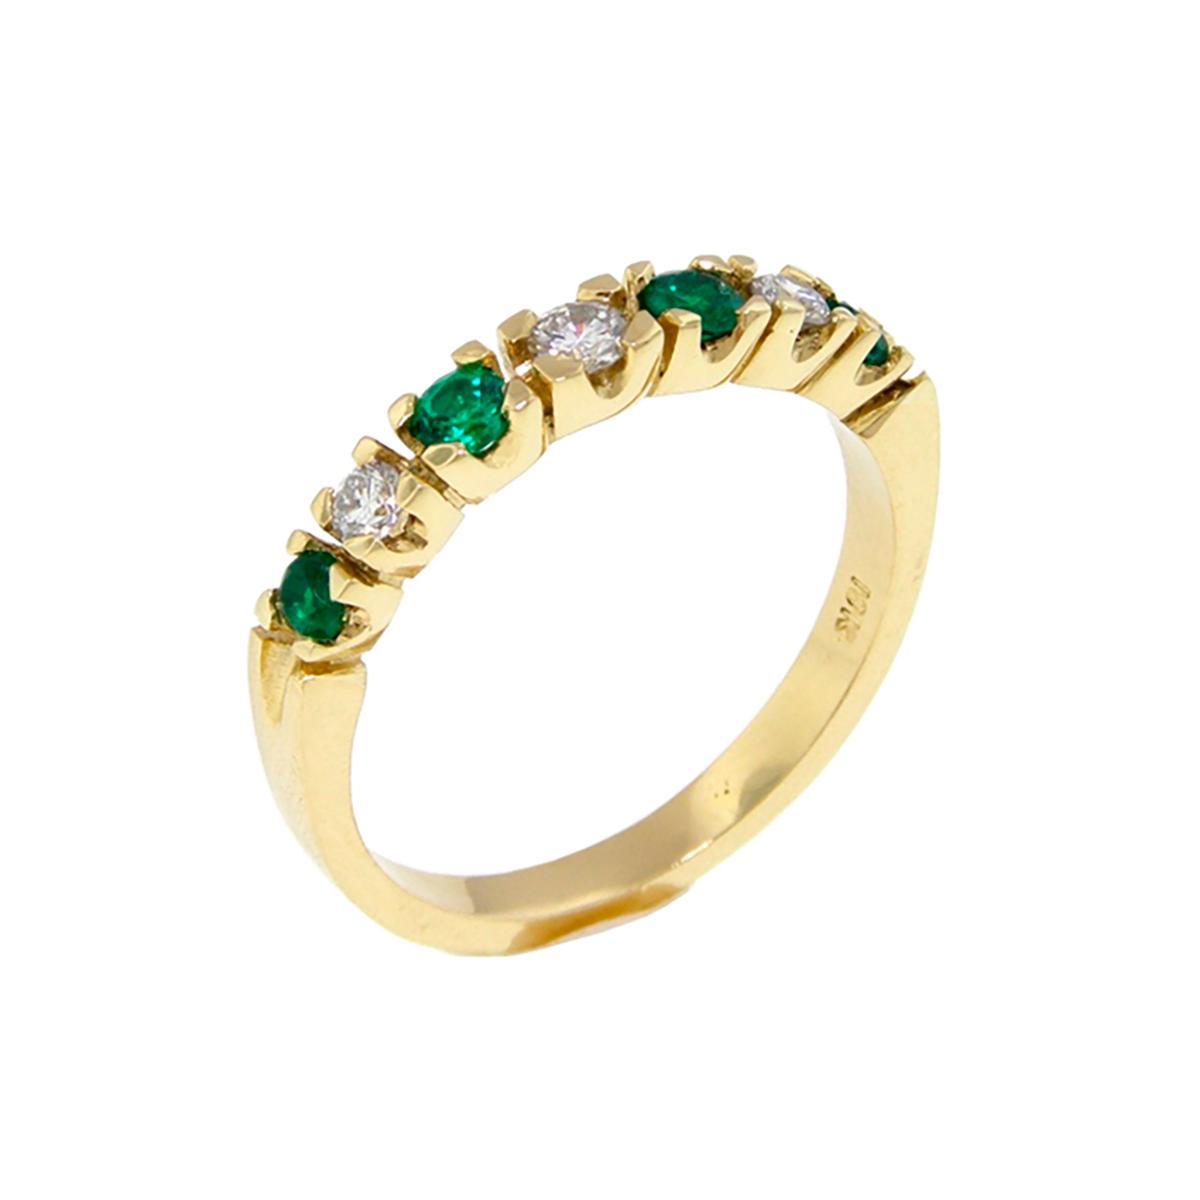 half-eternity-7-stone-diamond-and-emerald-wedding-band-ring-in-18k-gold